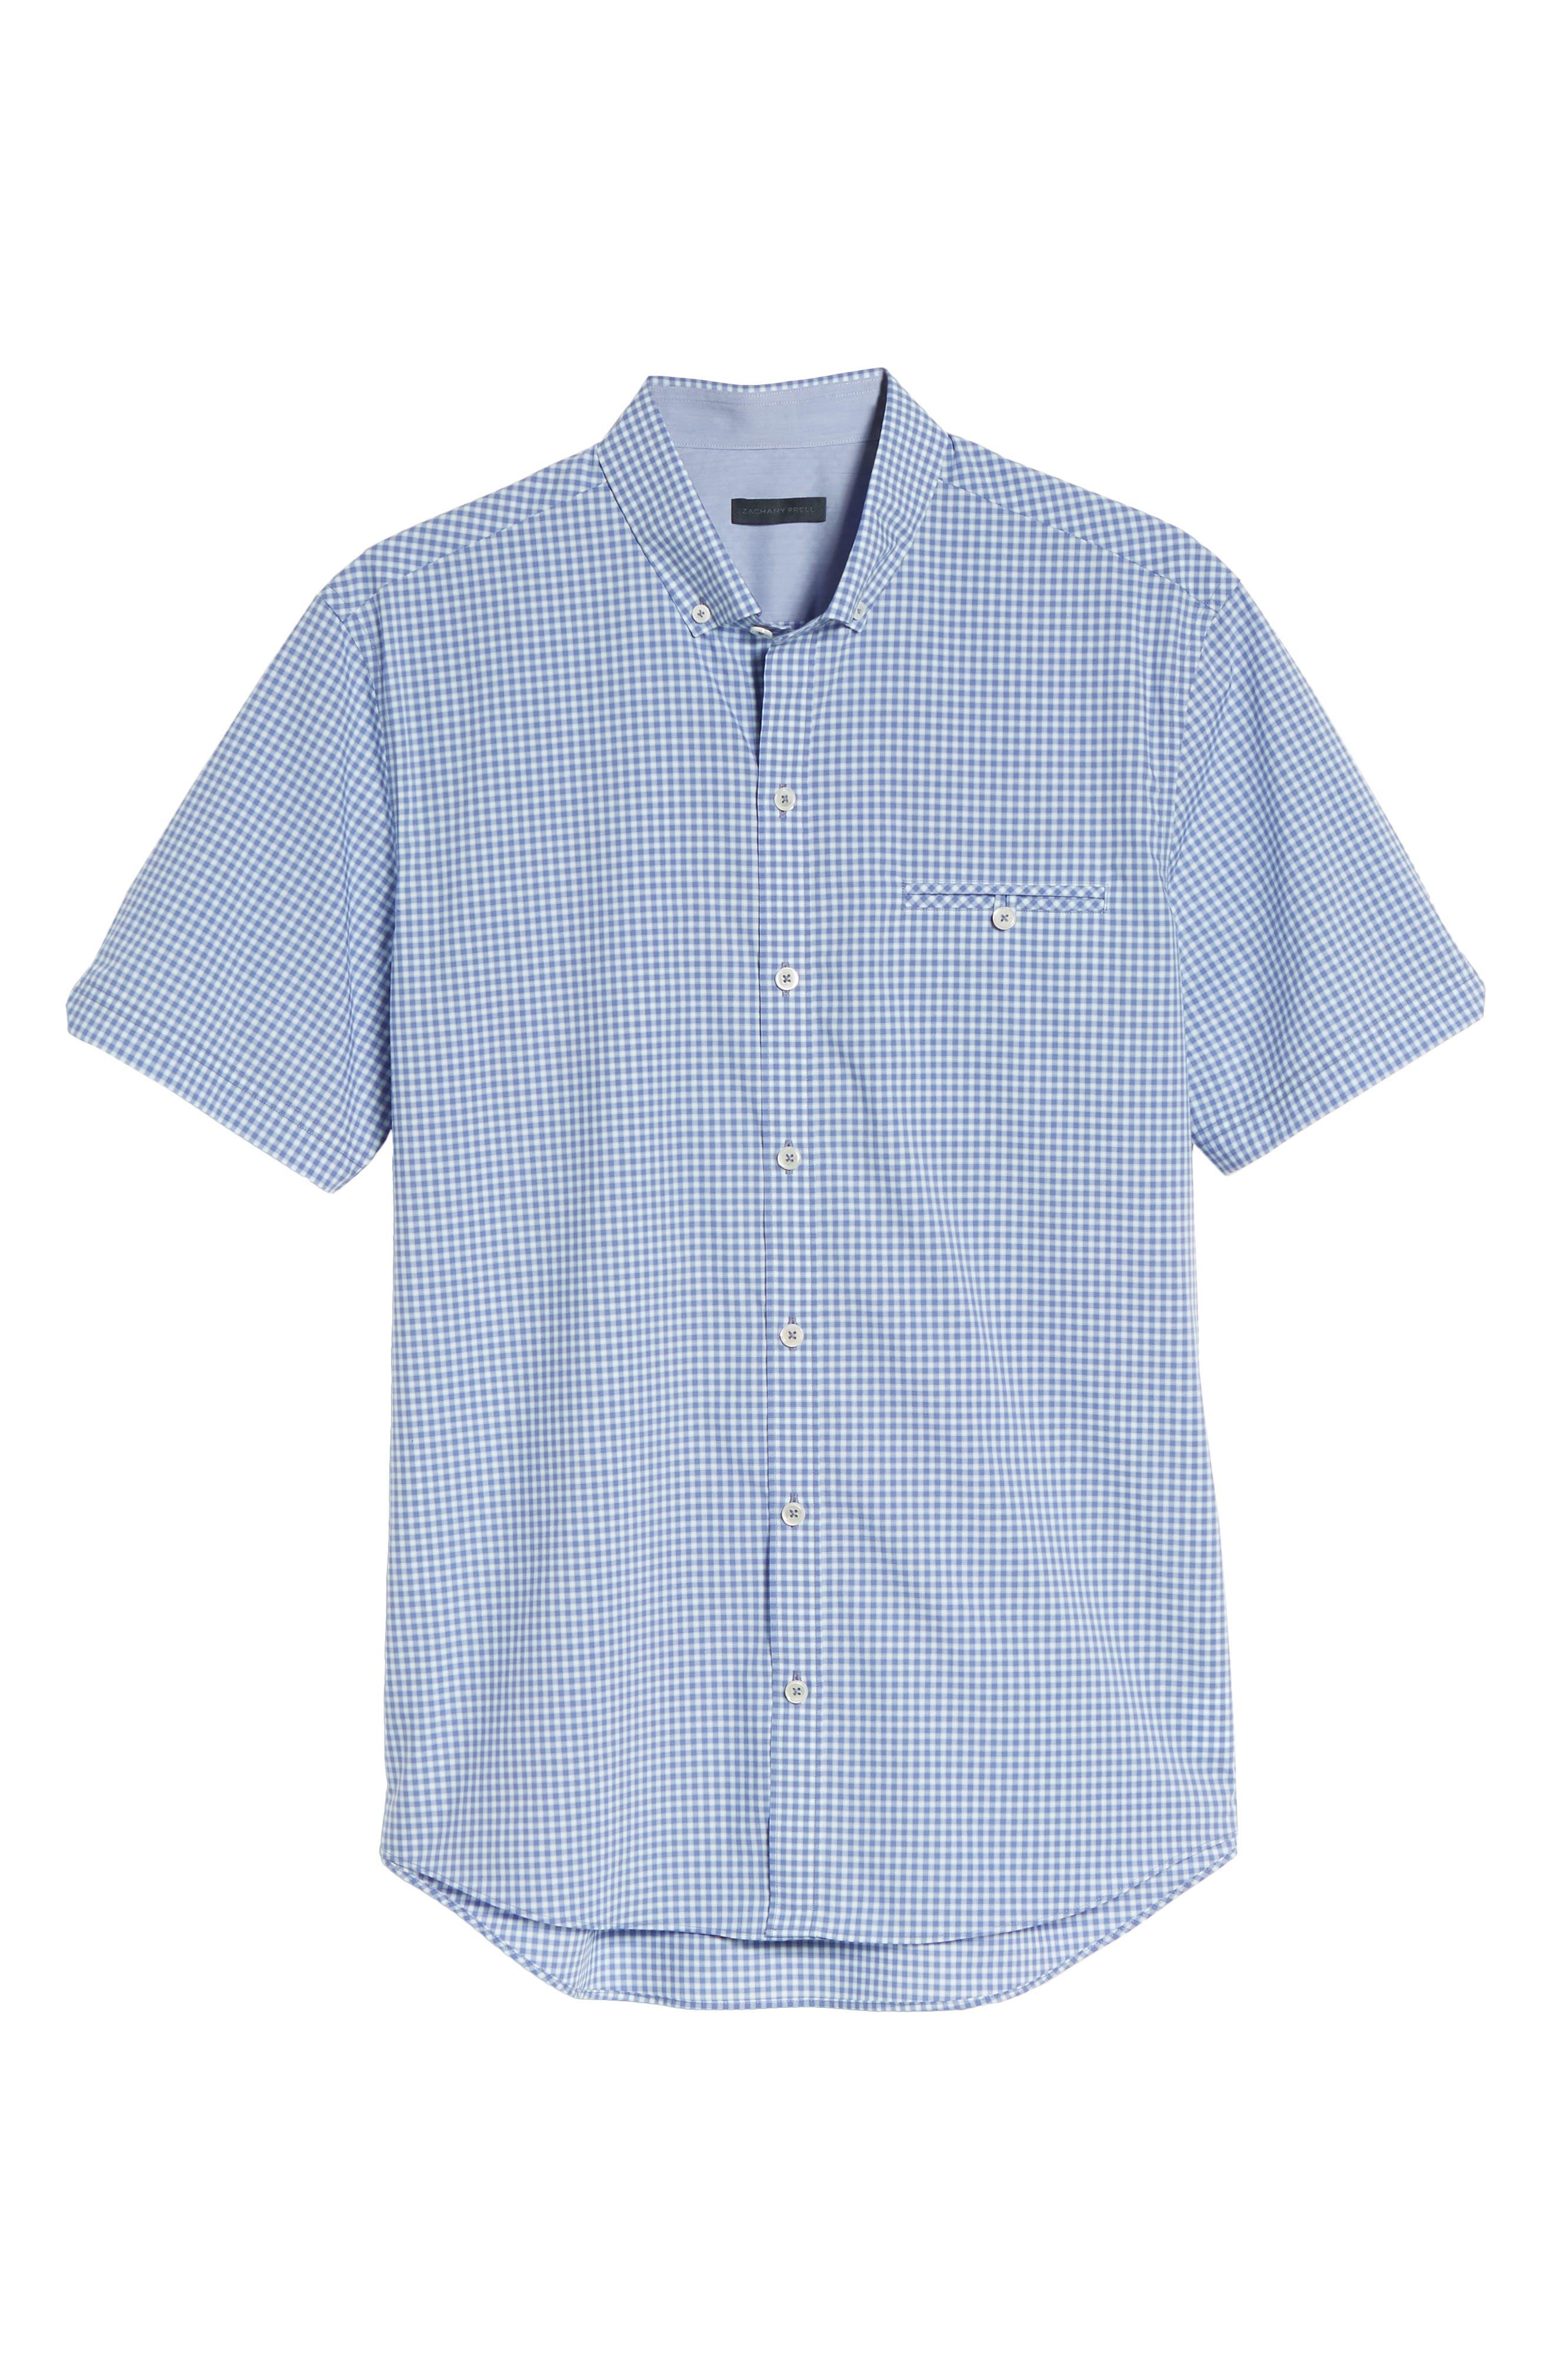 Giovinco Plaid Sport Shirt,                             Alternate thumbnail 6, color,                             422